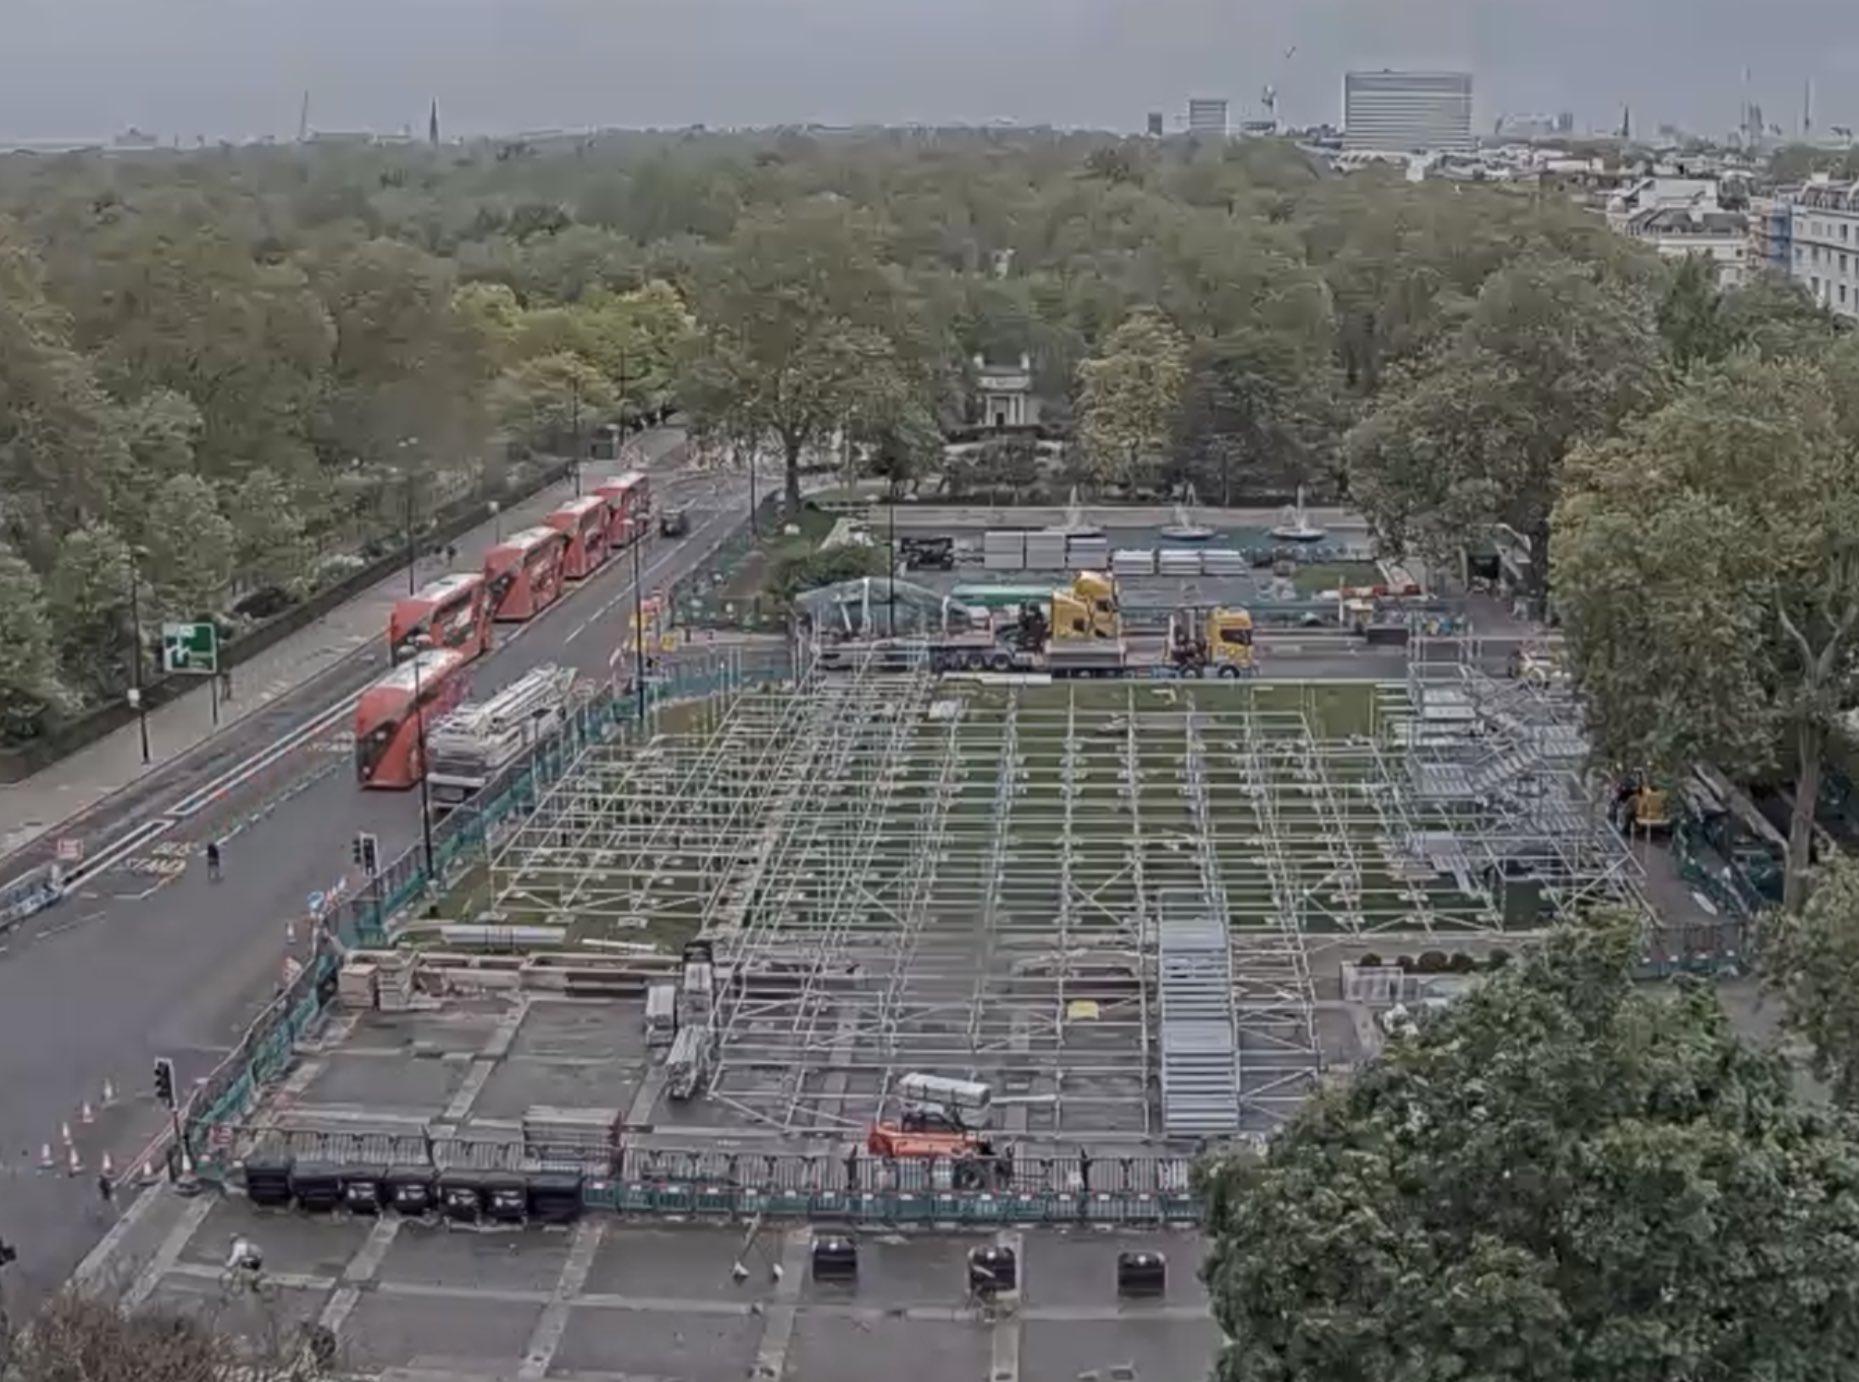 E12dRJJXsAE ye7?format=jpg&name=large - A hill grows in London #1